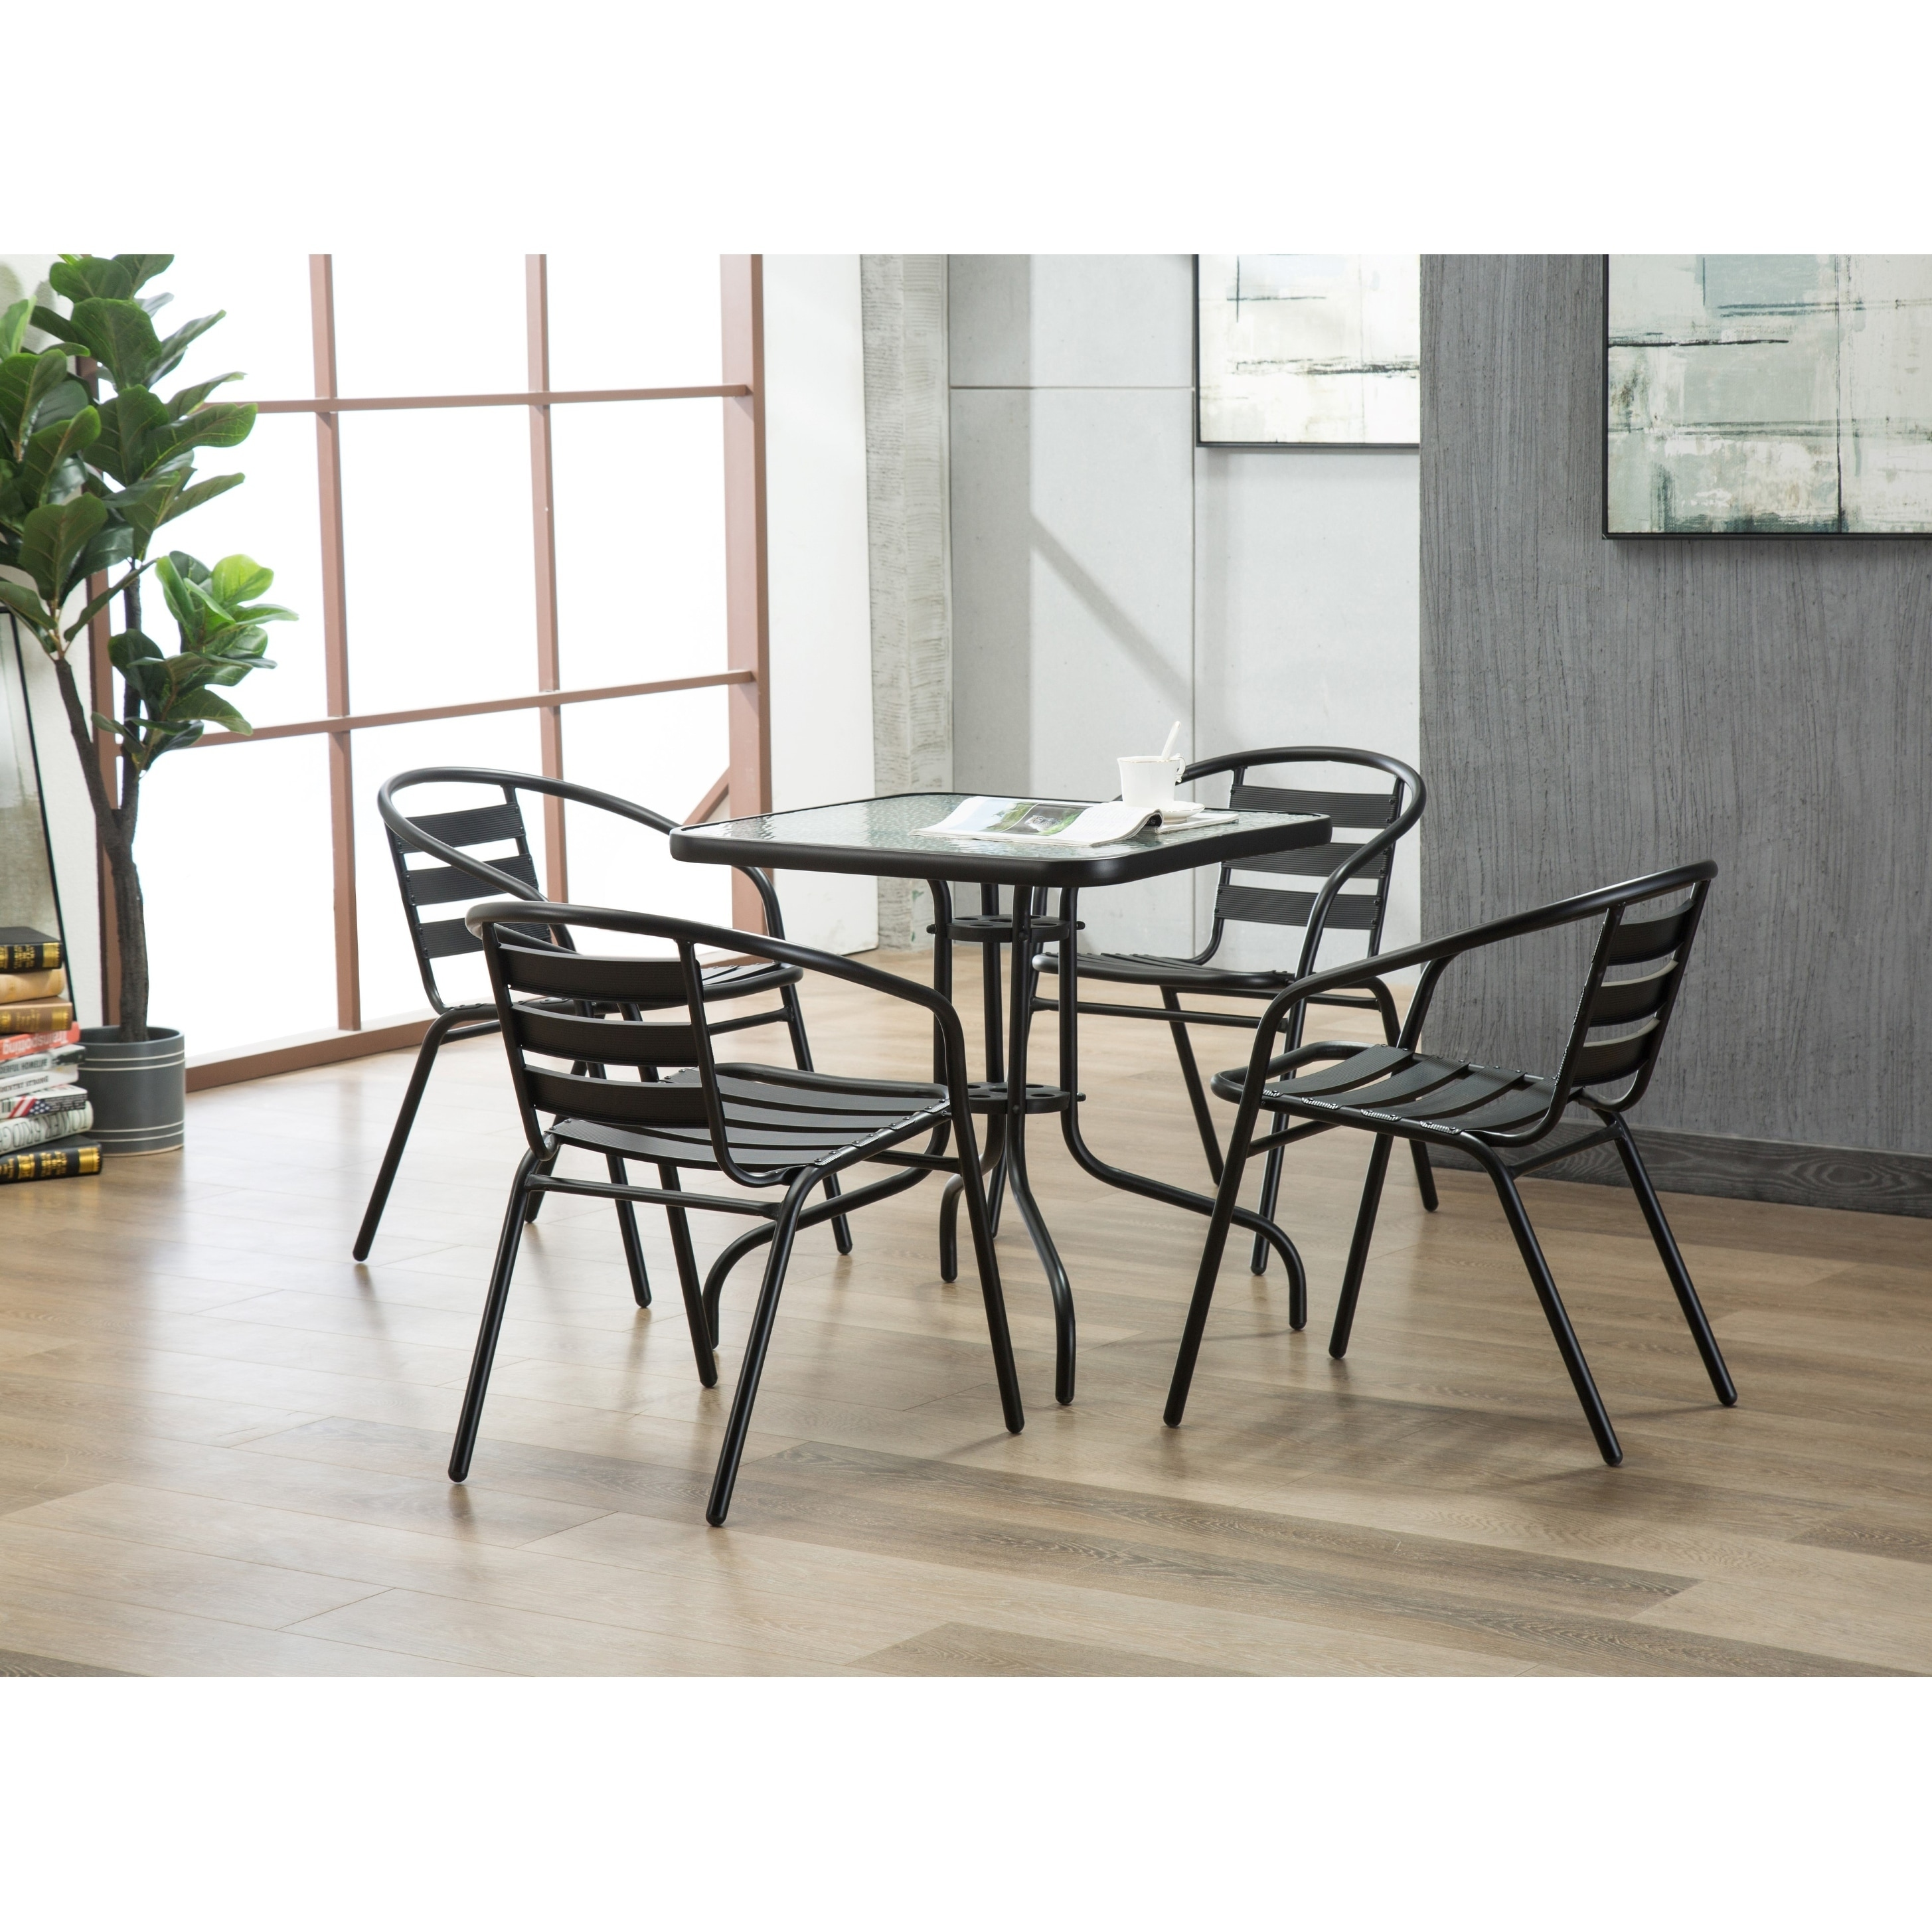 Magnificent Porthos Home Indoor Outdoor Metal Restaurant Stack Chair Set Short Links Chair Design For Home Short Linksinfo